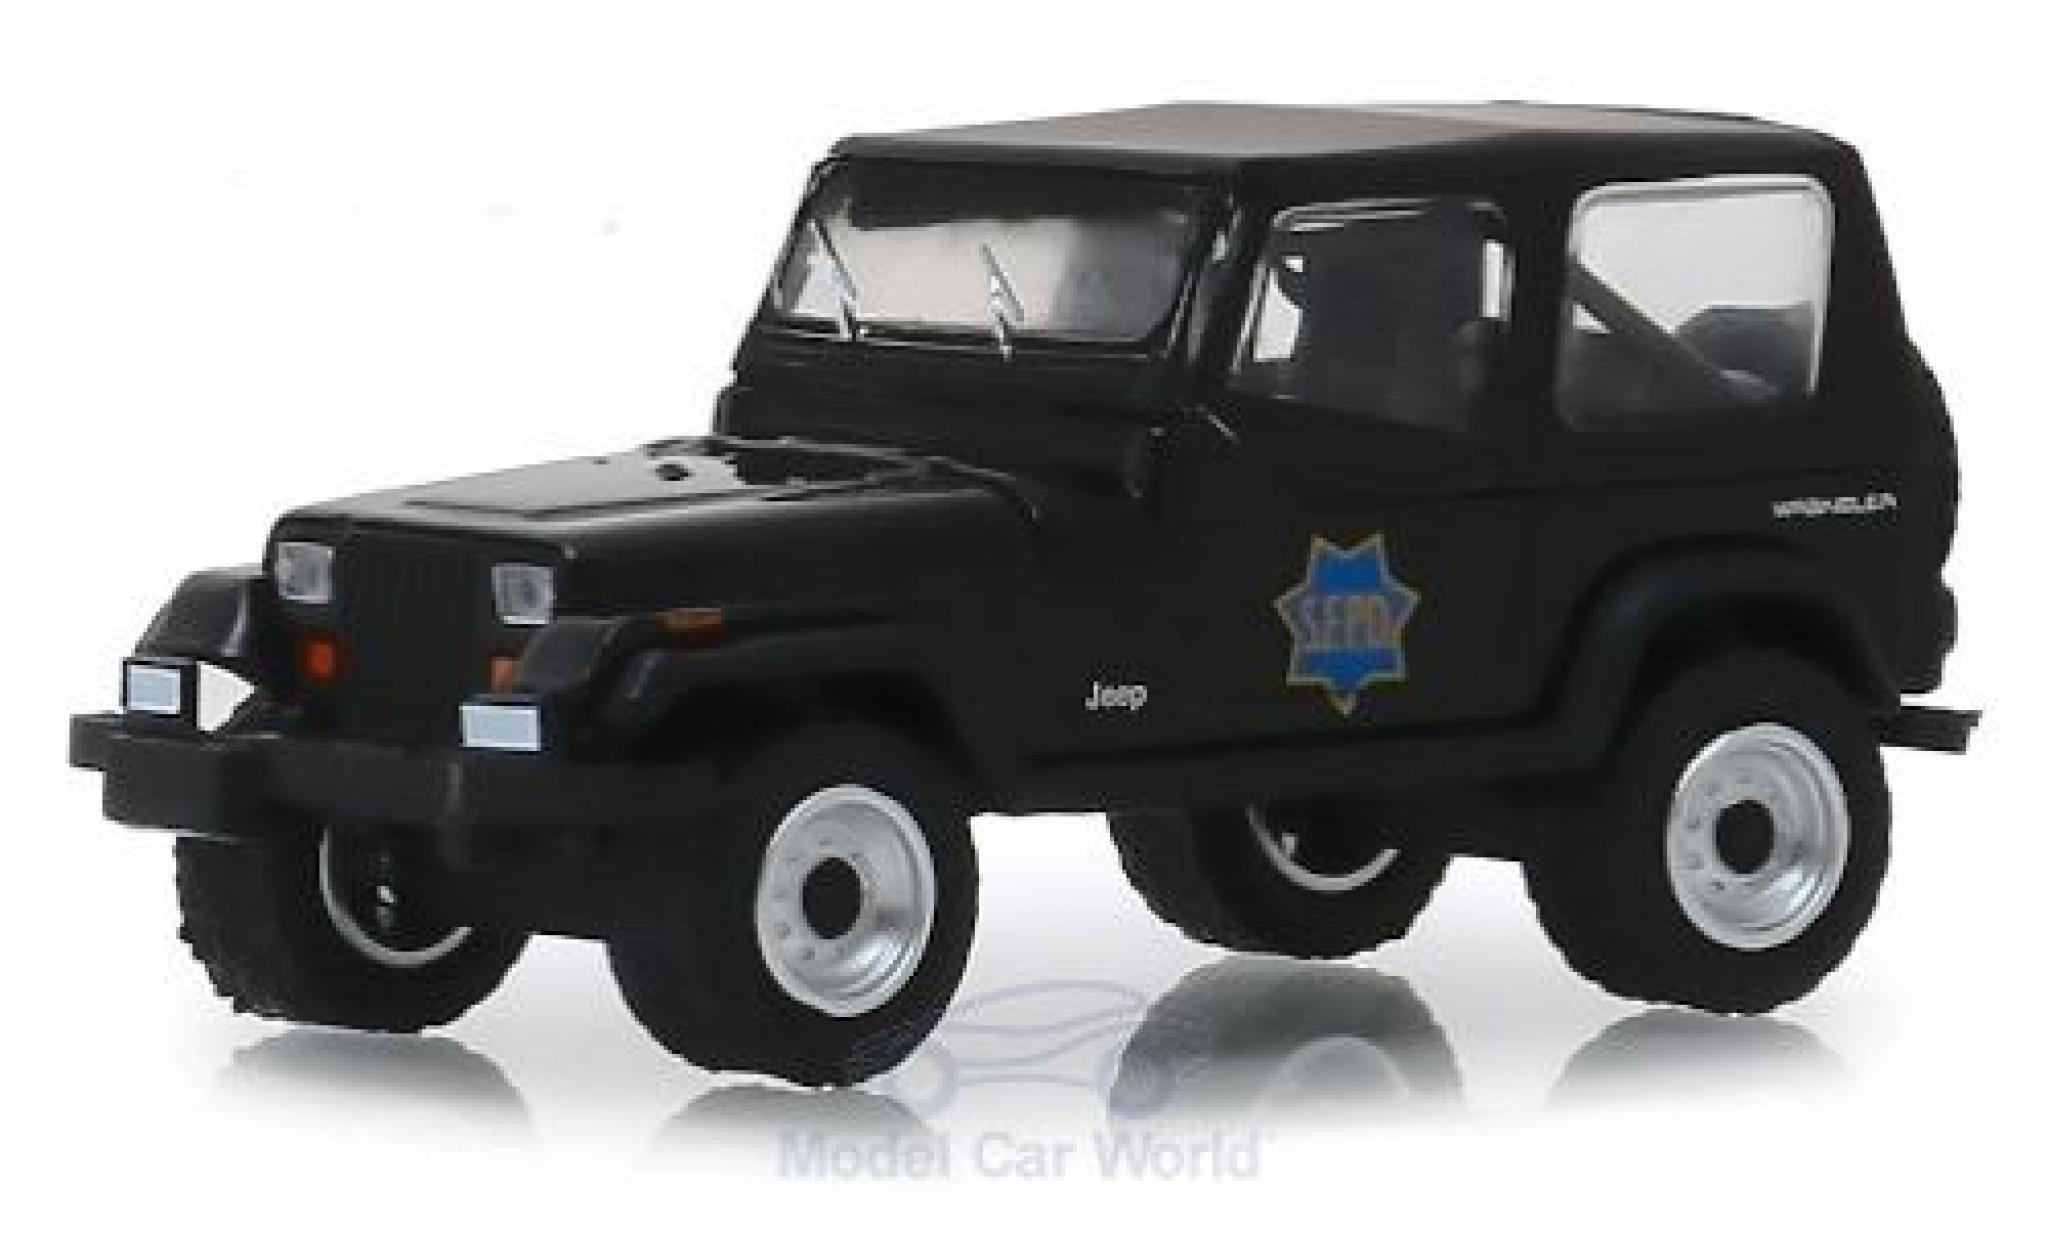 Jeep Wrangler 1/64 Greenlight YJ S.F.P.D. - San Francisco Police Department 1994